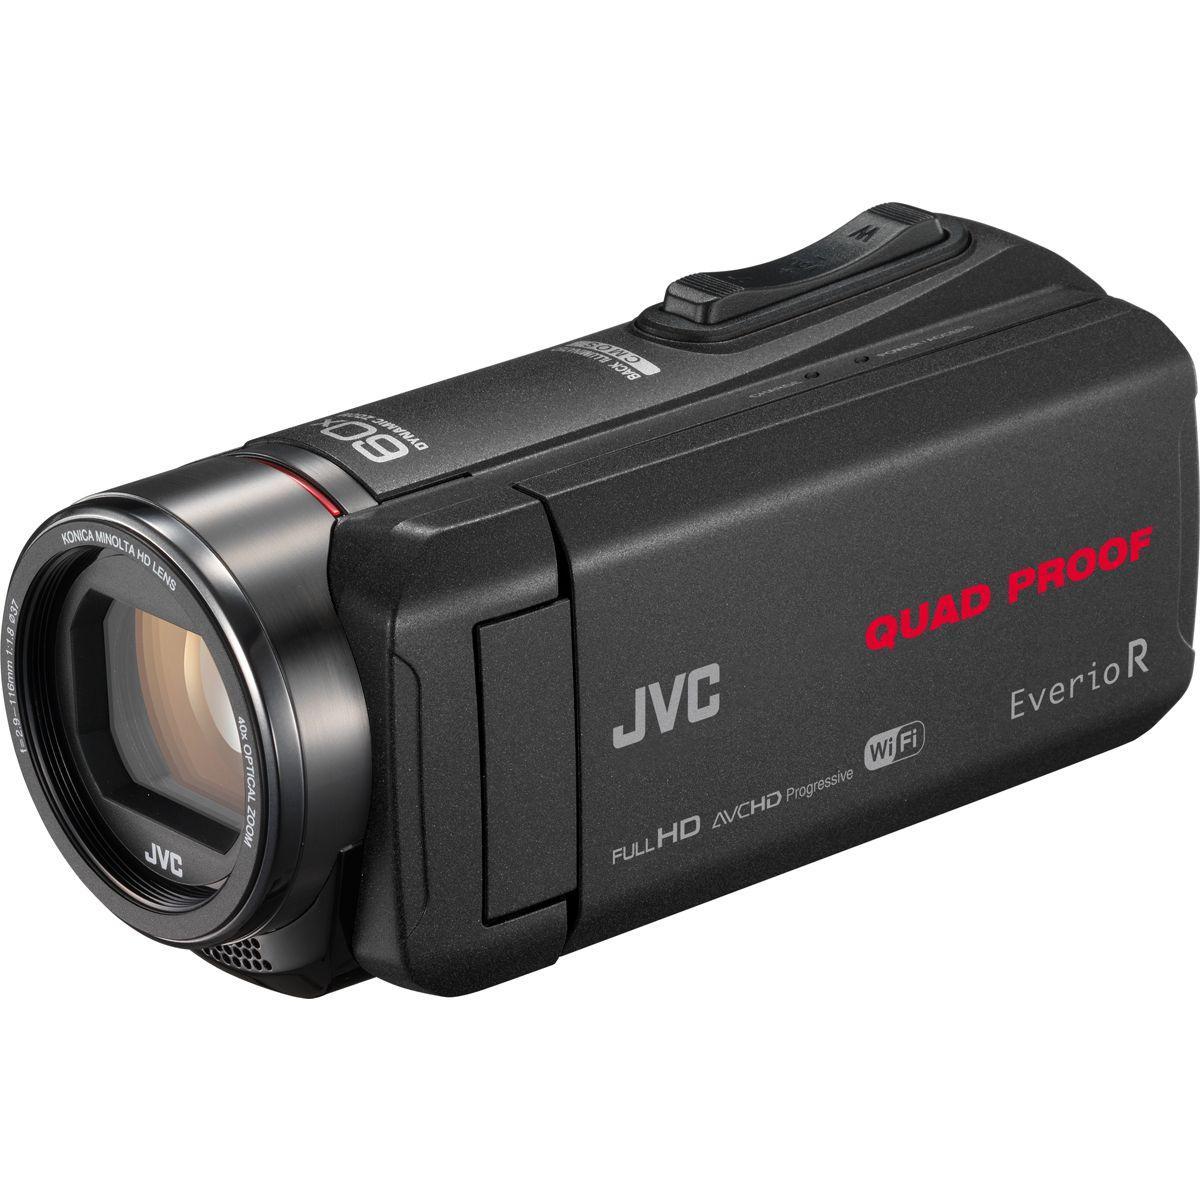 Camescope jvc gz-rx640 wifi - 5% de remise : code multi5